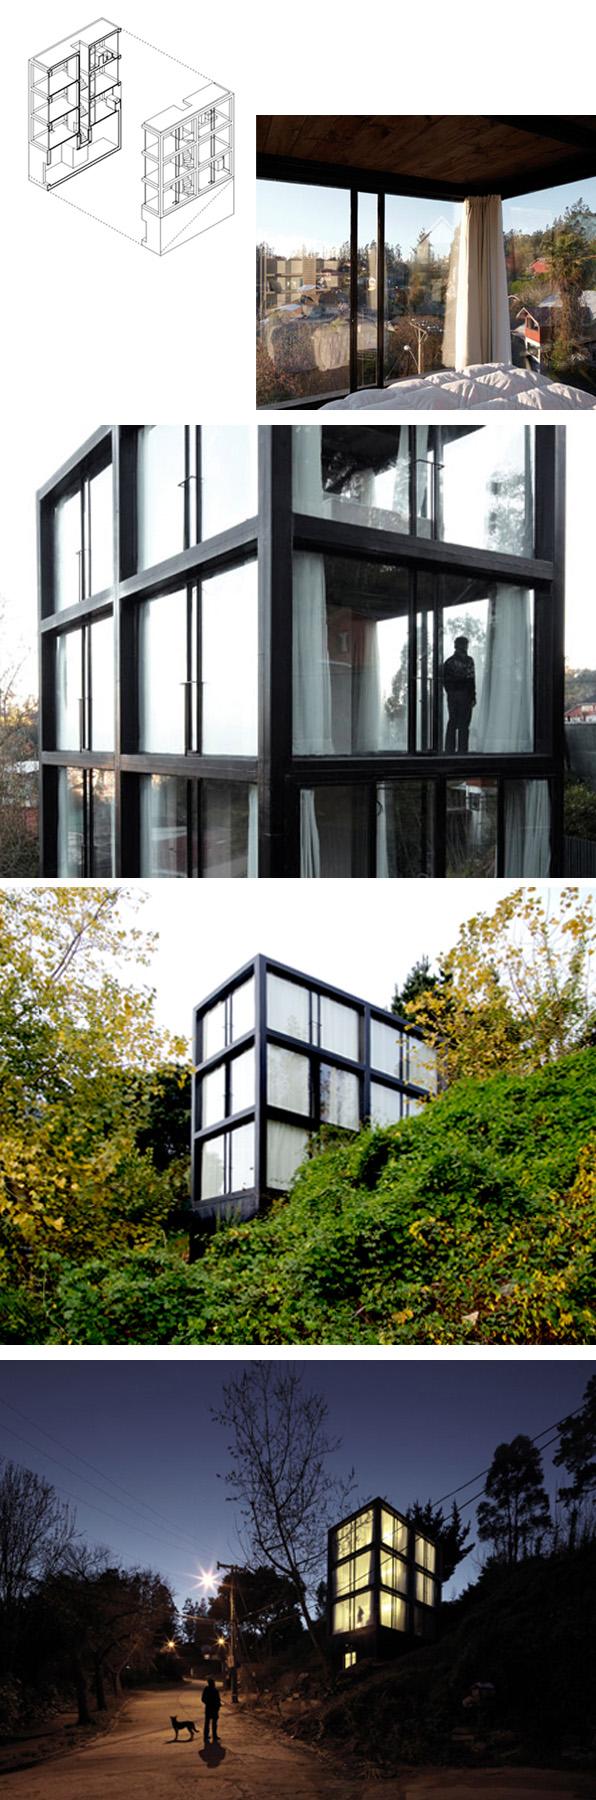 casa arco house pezo von ellrichshausen en modusvivendi arquietctura industrializada modular 01